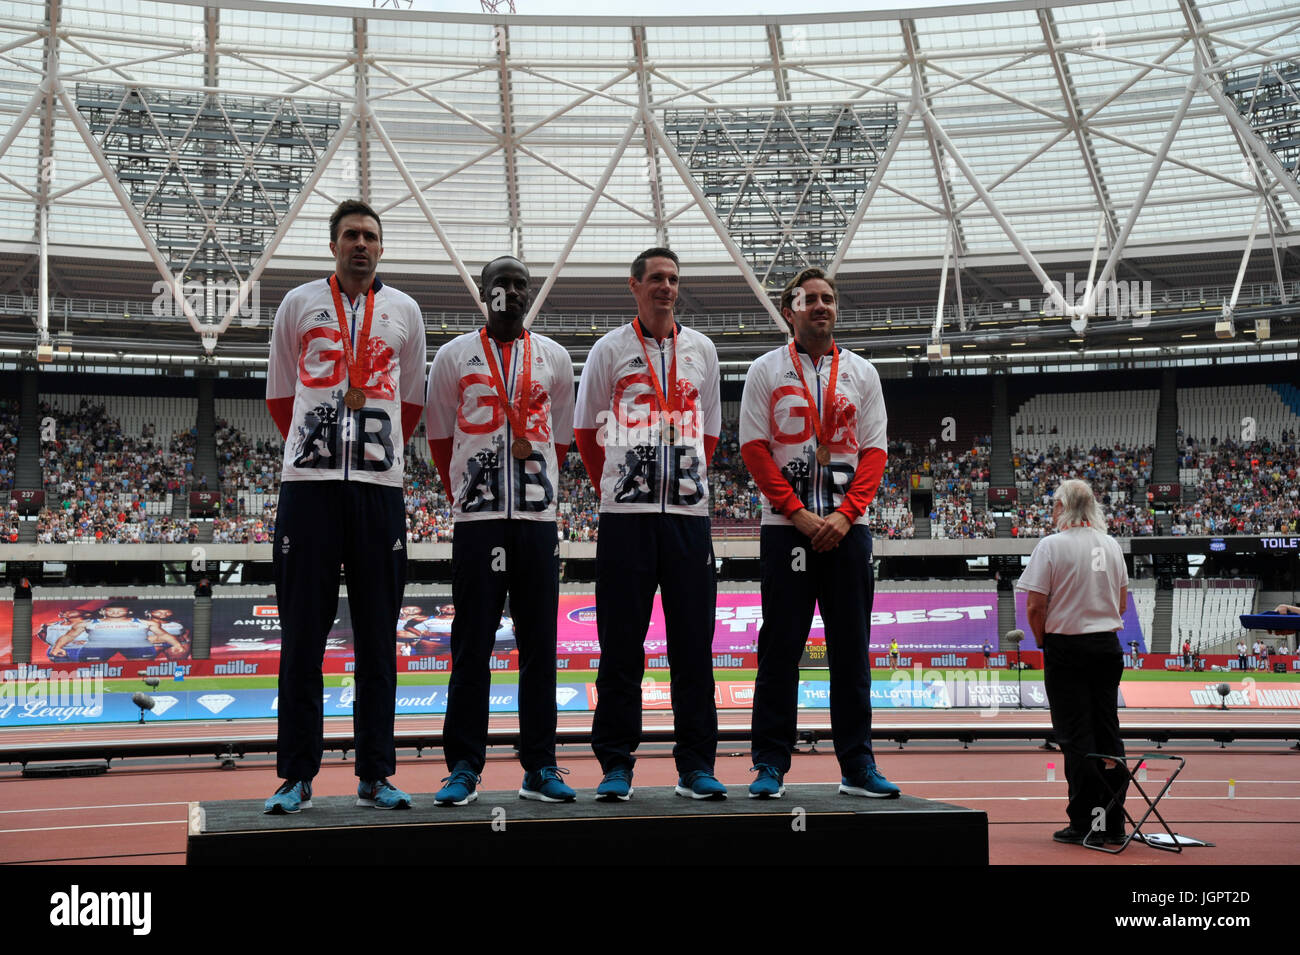 Stratford, UK. 9th Jul, 2017. Mens relay team receive medals 4X400m Martyn Rooney, Andrew Steel, Robert Tobin, Michael - Stock Image